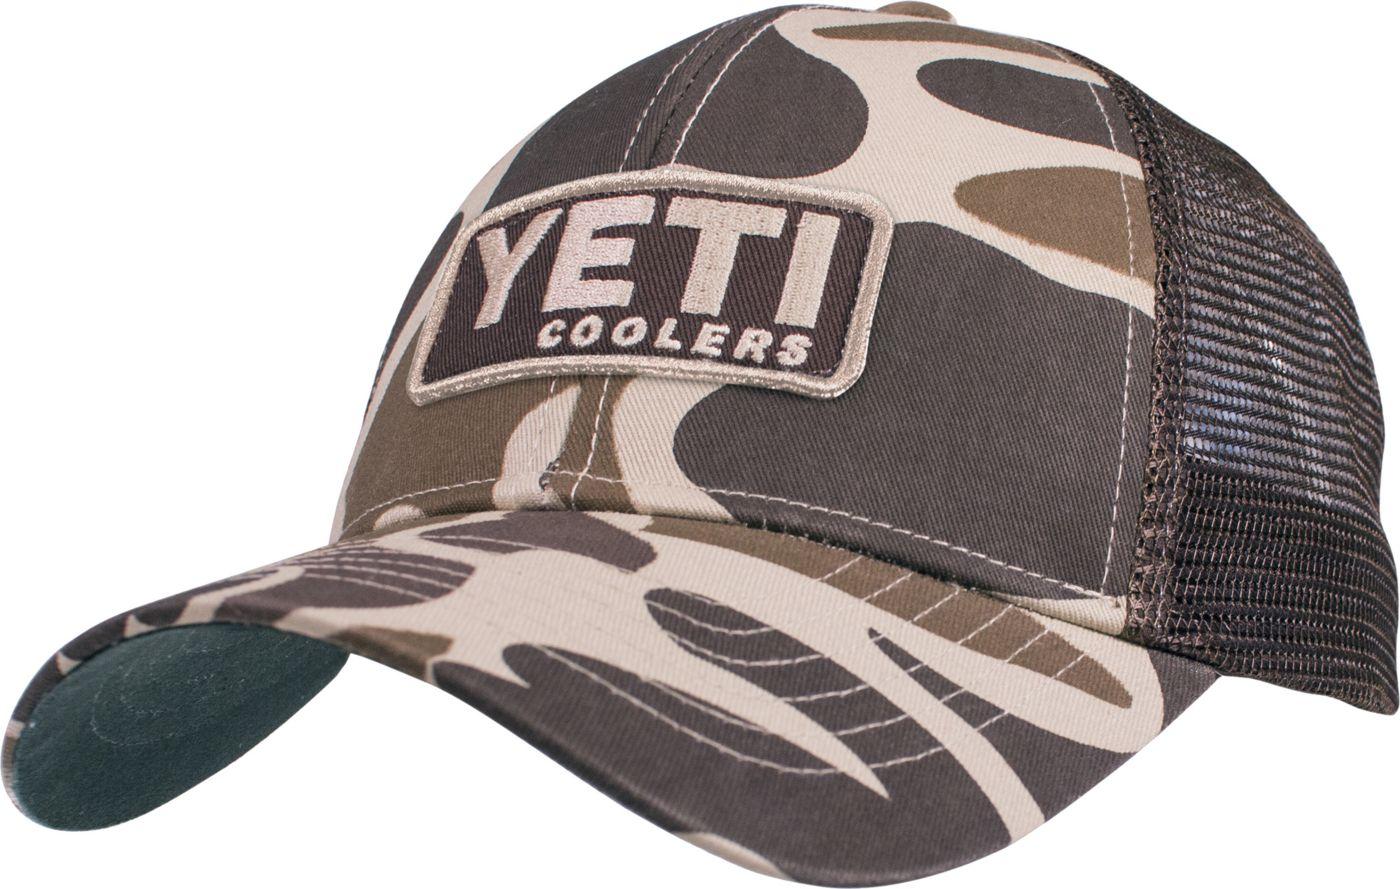 YETI Men's Custom Camo Patch Hat